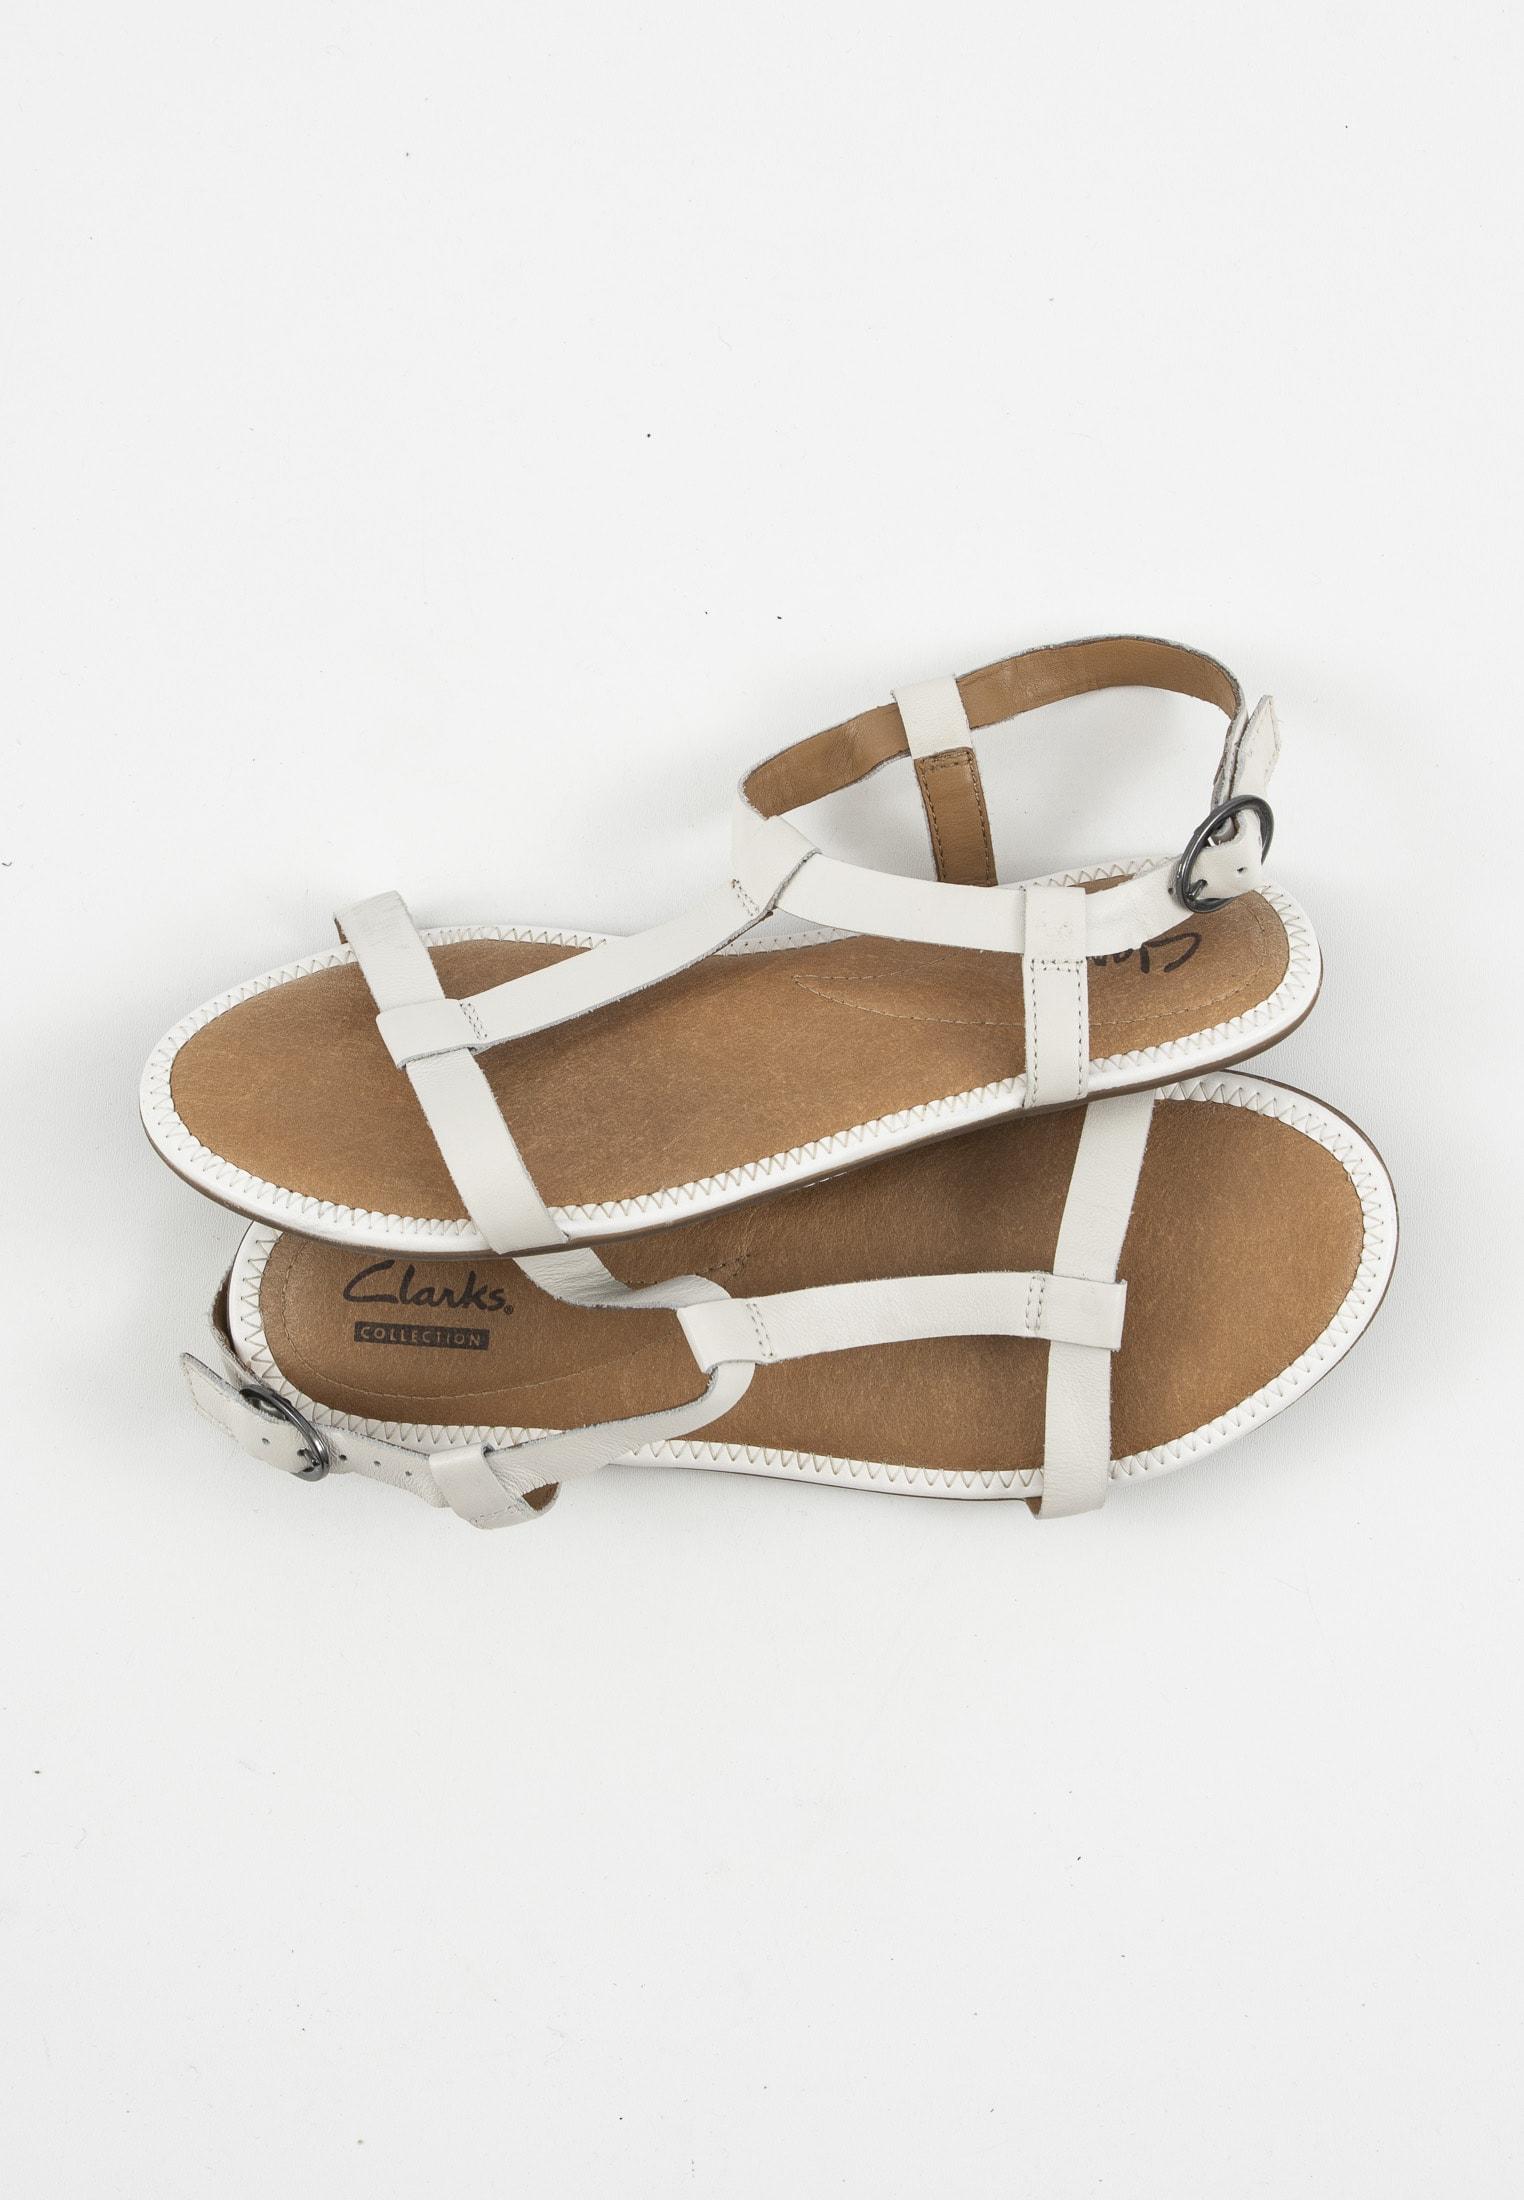 Clarks Sandale Weiß Gr.39